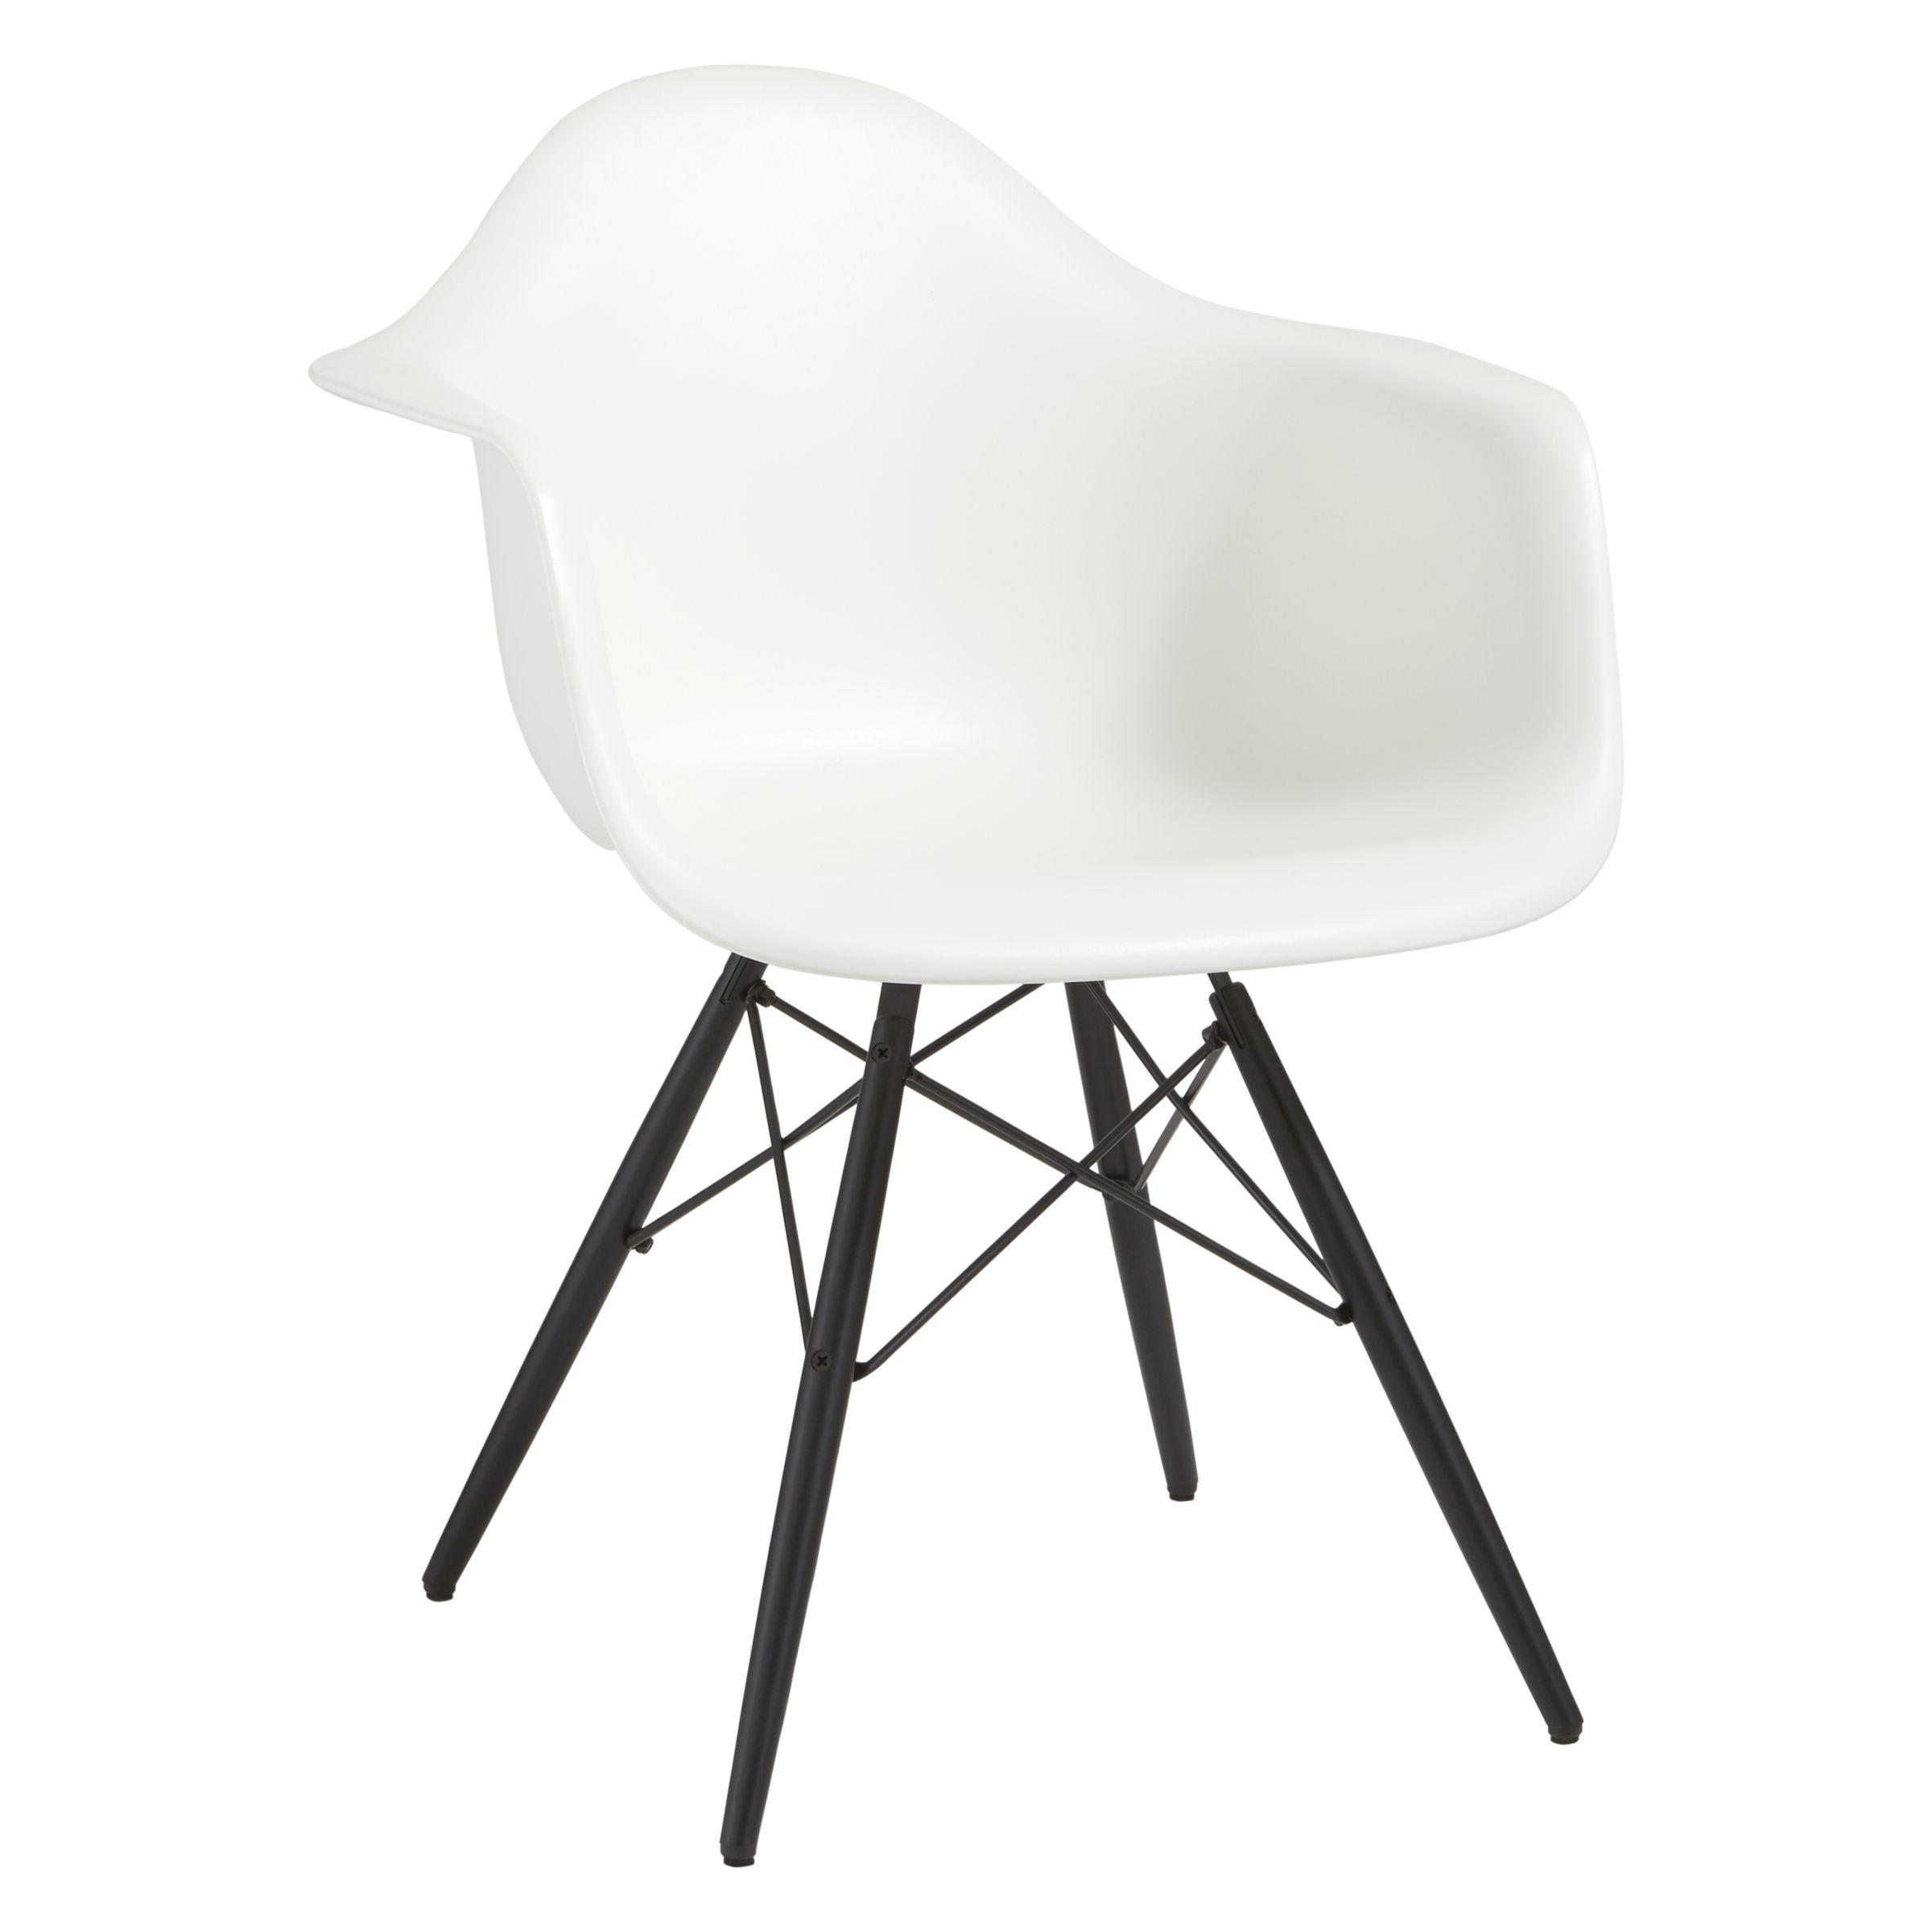 Vitra Vitra Eames DAW Armchair, Black Maple Leg